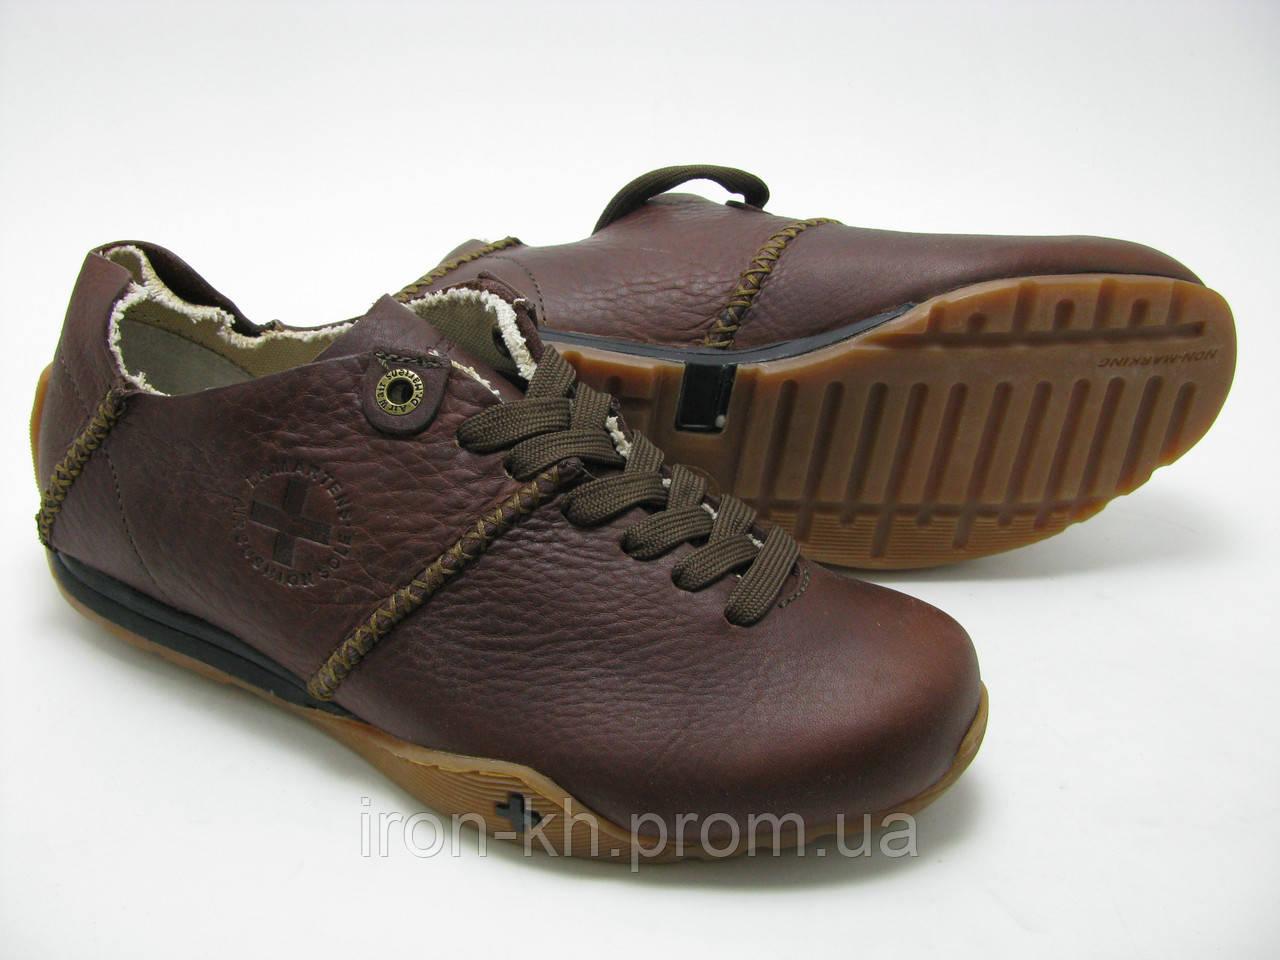 Обувь Мужская Dr. Martens Air Cushion Sole - Интернет-магазин in-style в 768cd1178b632